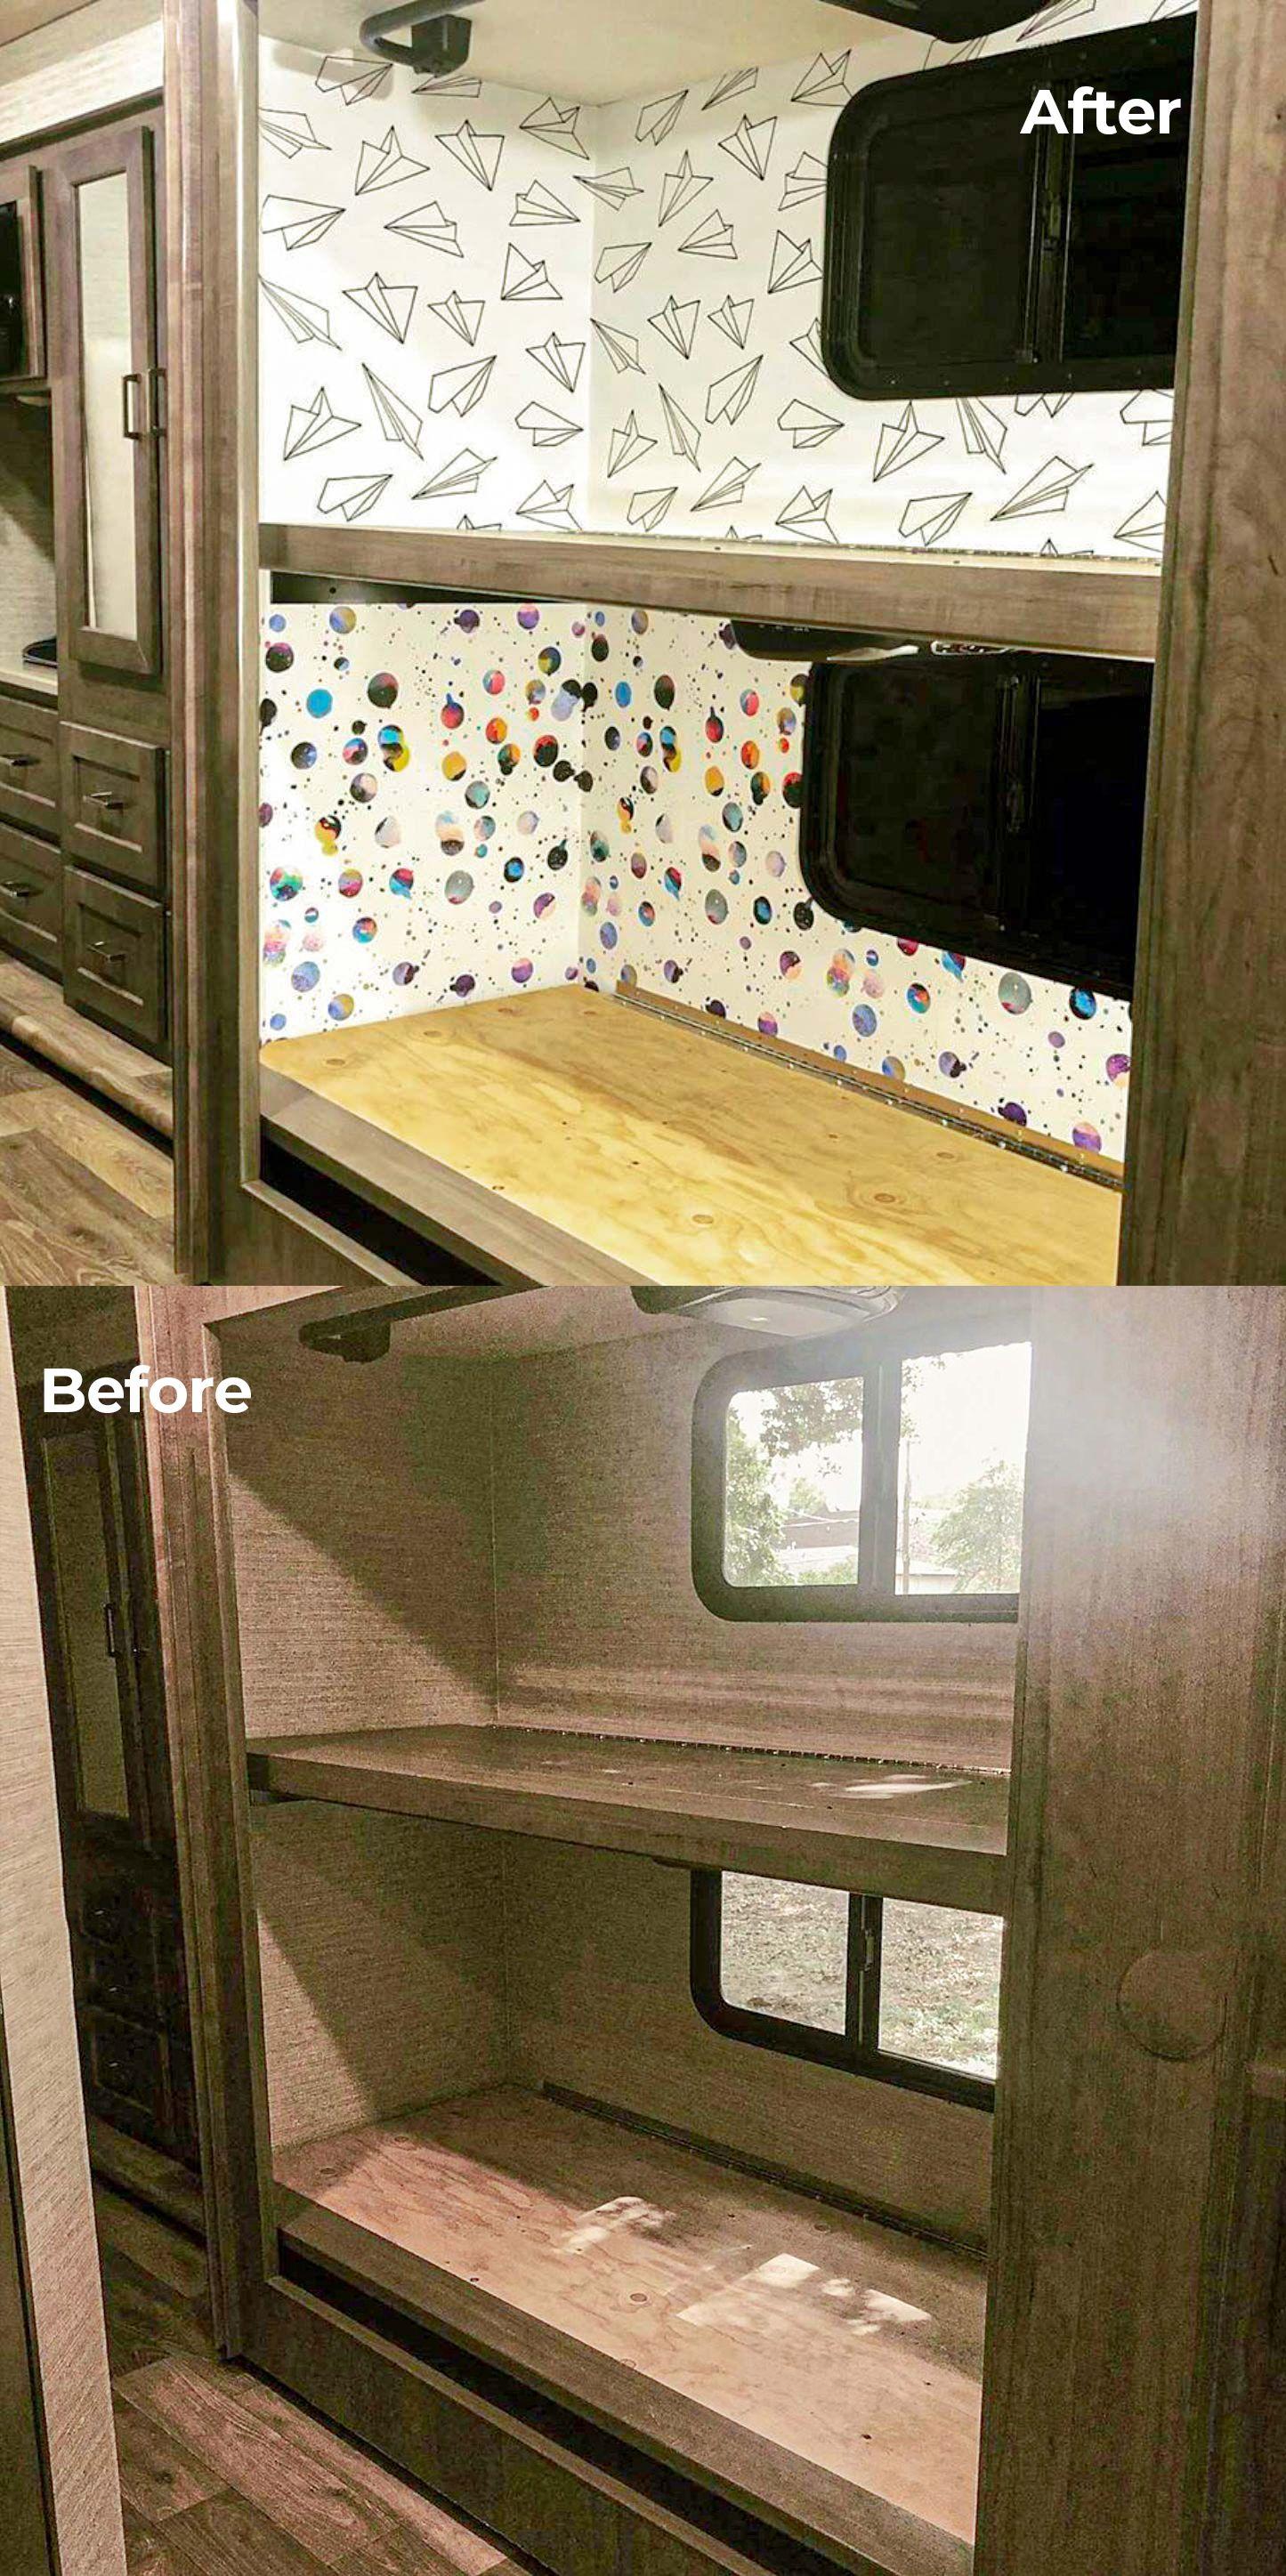 Rv Transformation Peel And Stick Wallpaper Removable Wallpaper Design Your Home Peel And Stick Wallpaper